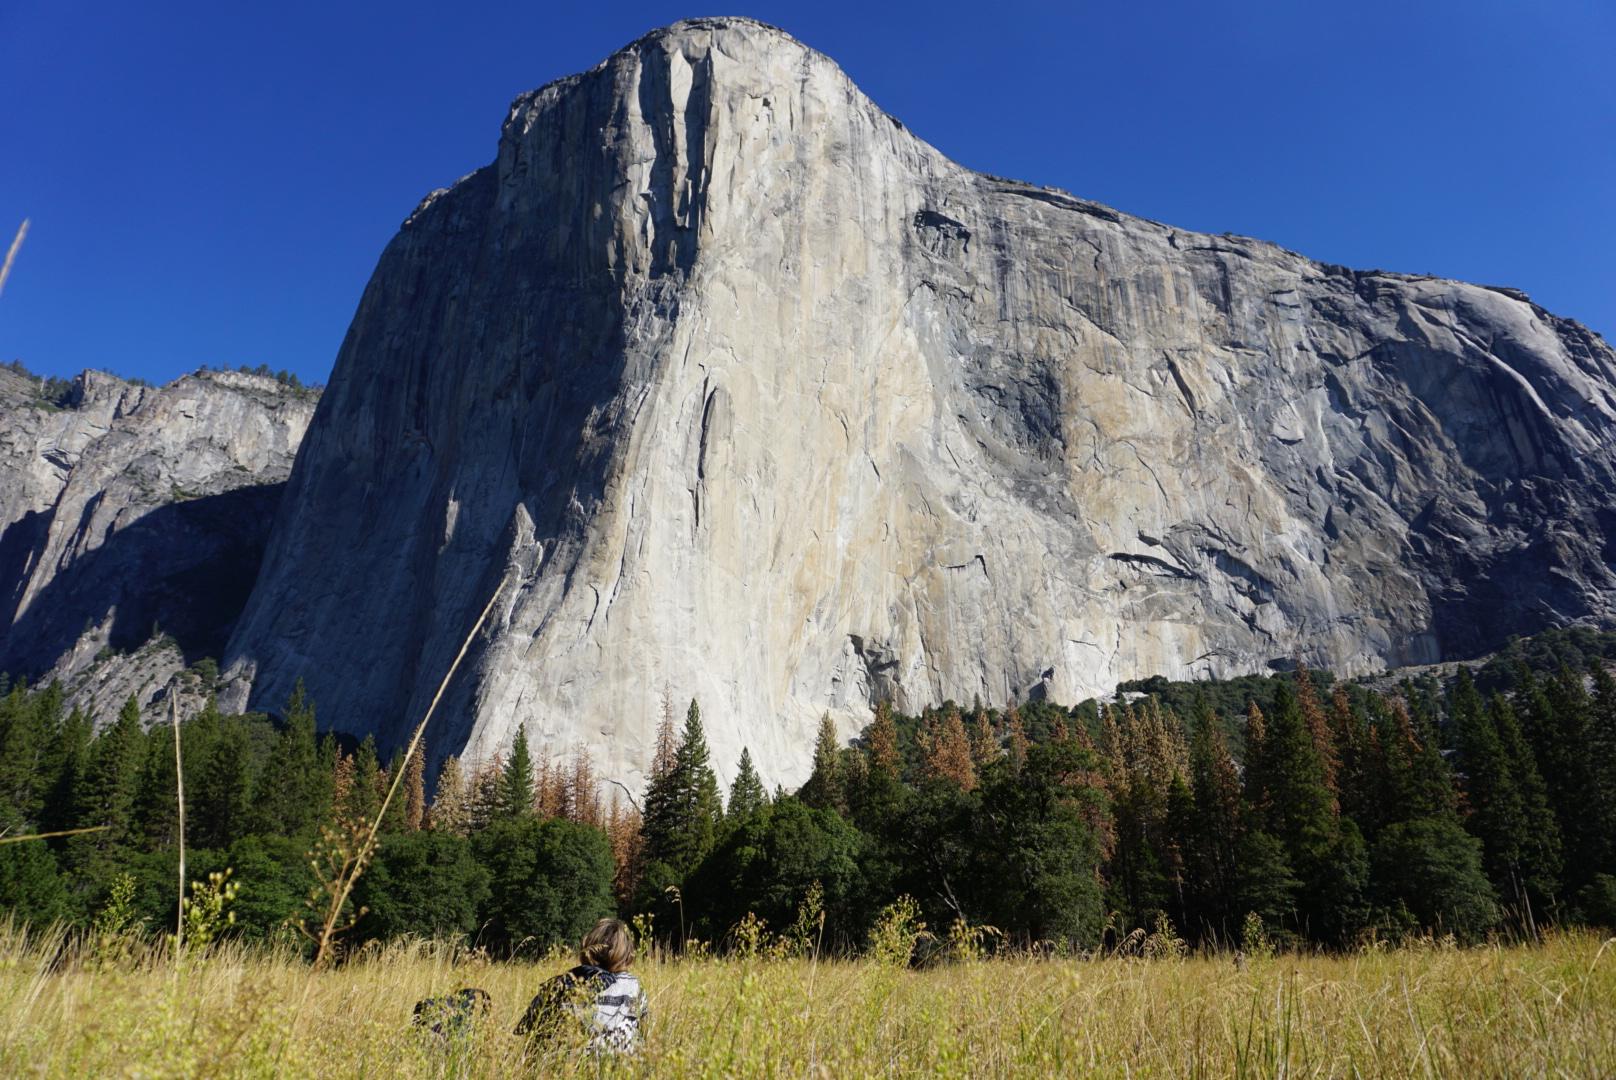 Above : Yosemite National Park